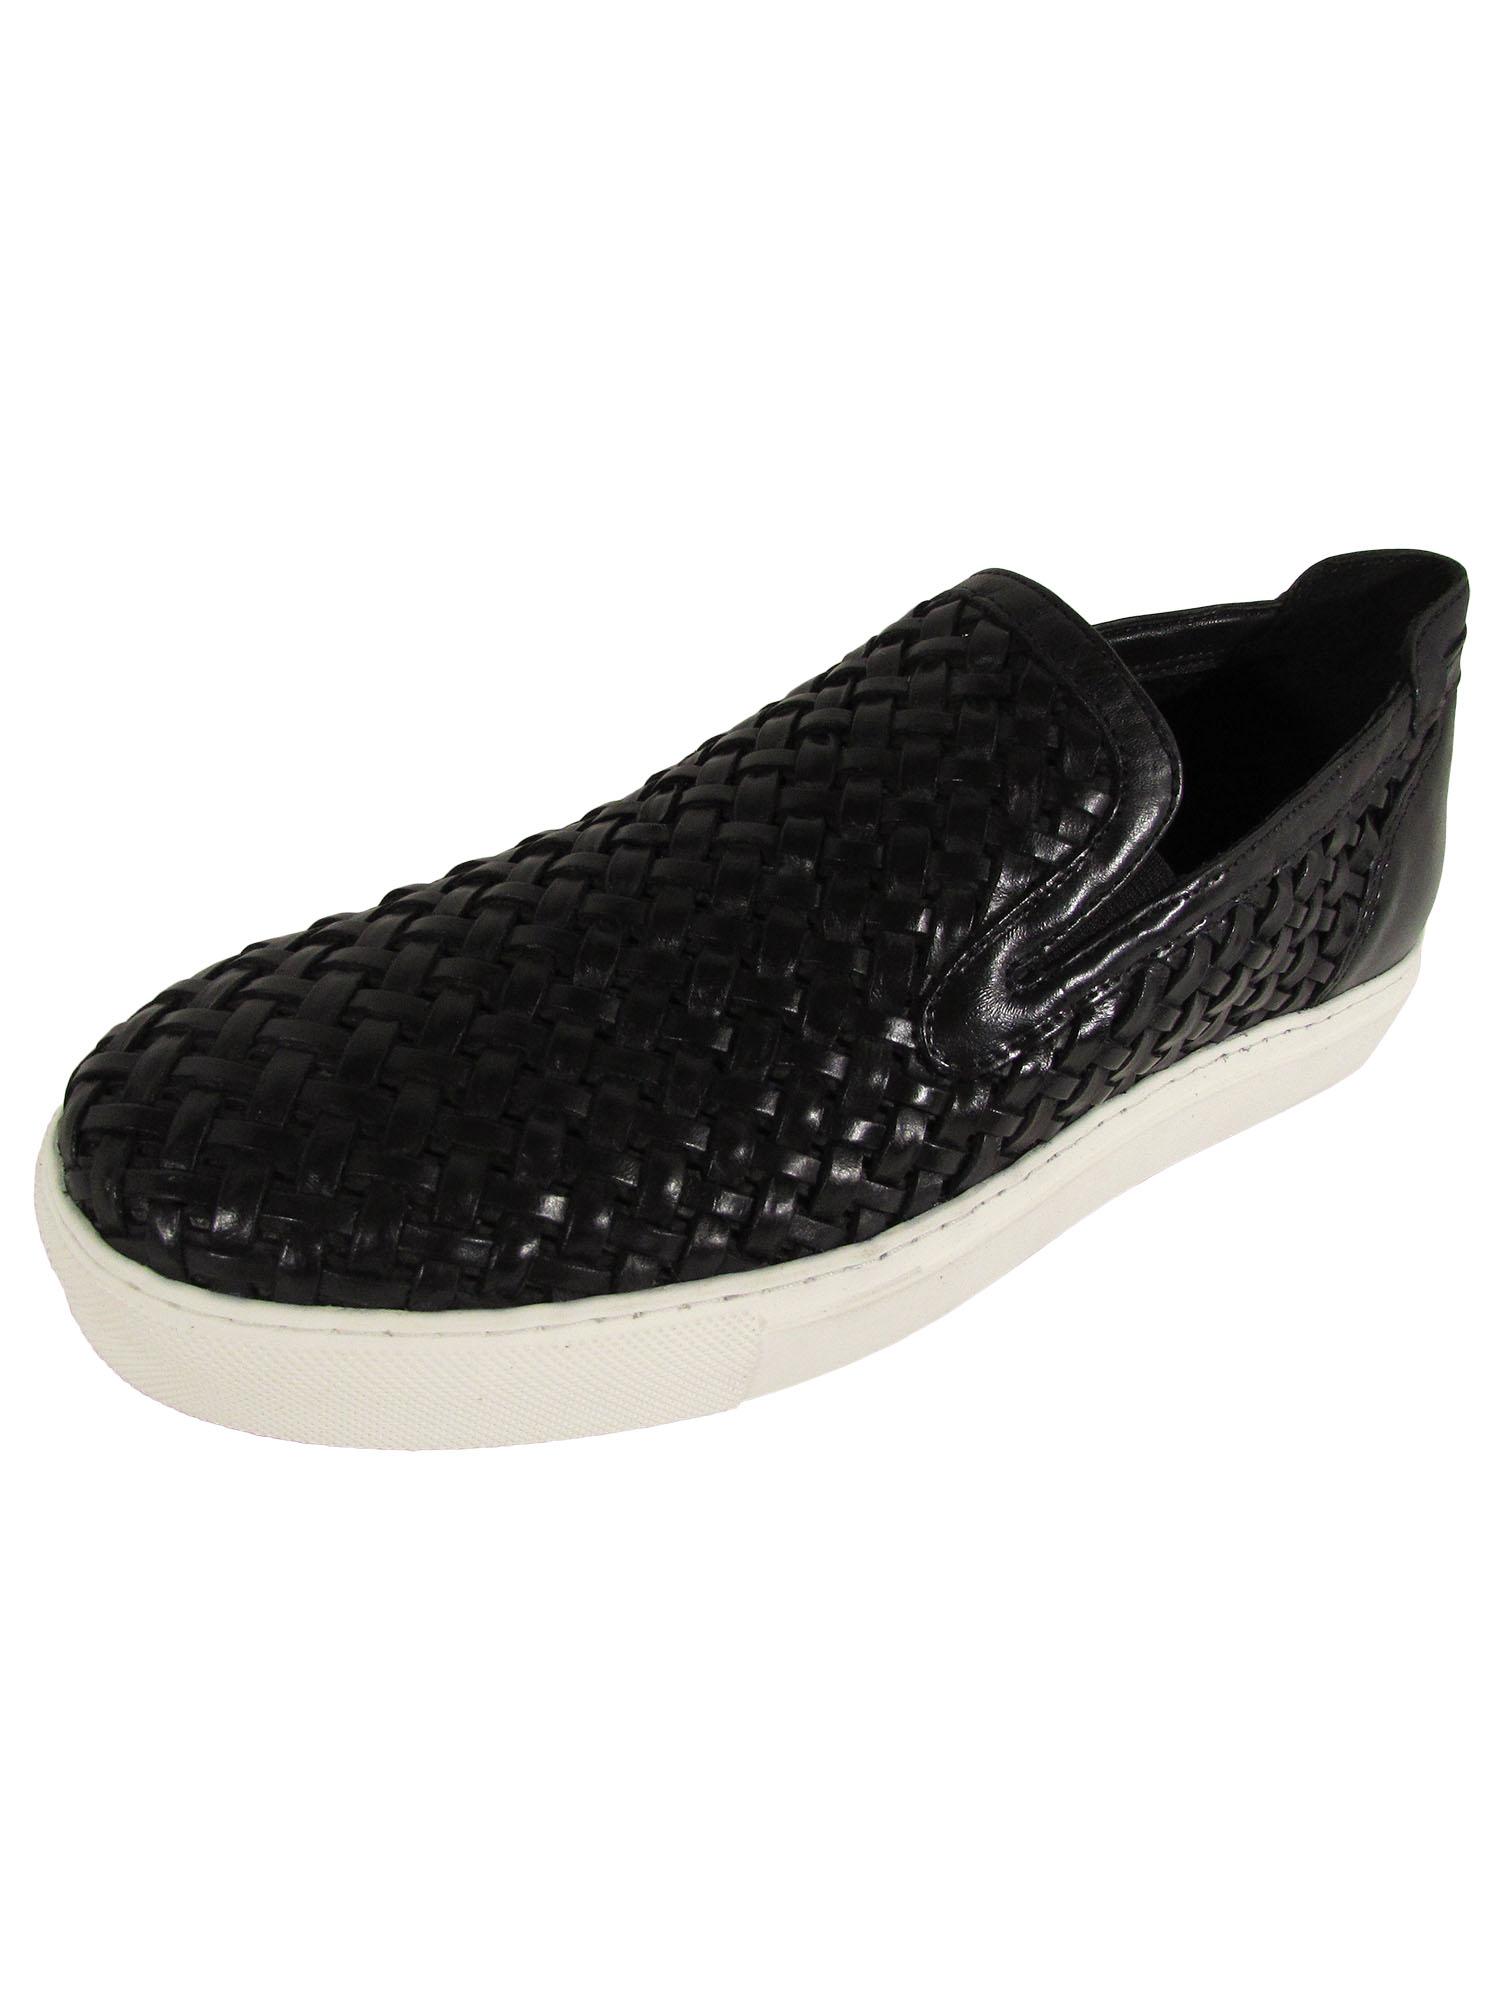 Donald J Pliner Uomo Clark-96 Woven  Nappa  Woven Shoes